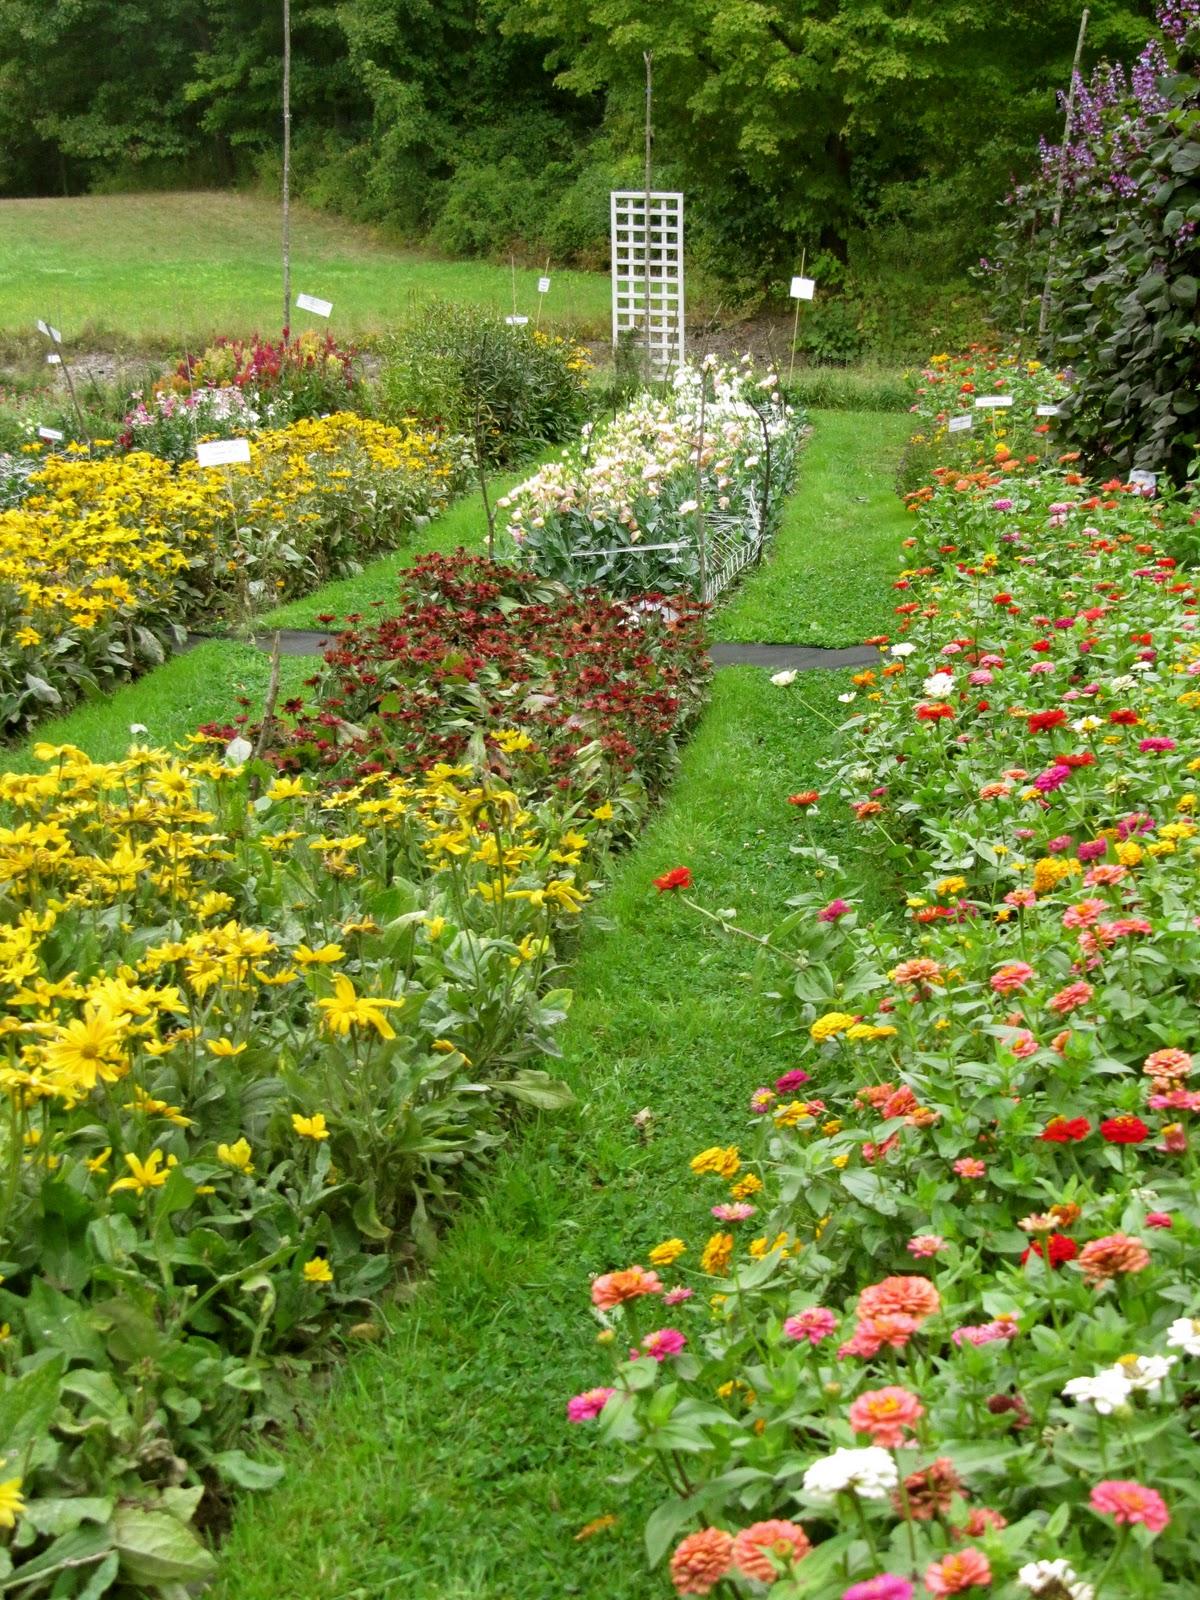 The Song Garden Flower Farm and Tea House of Cornish, NH  February